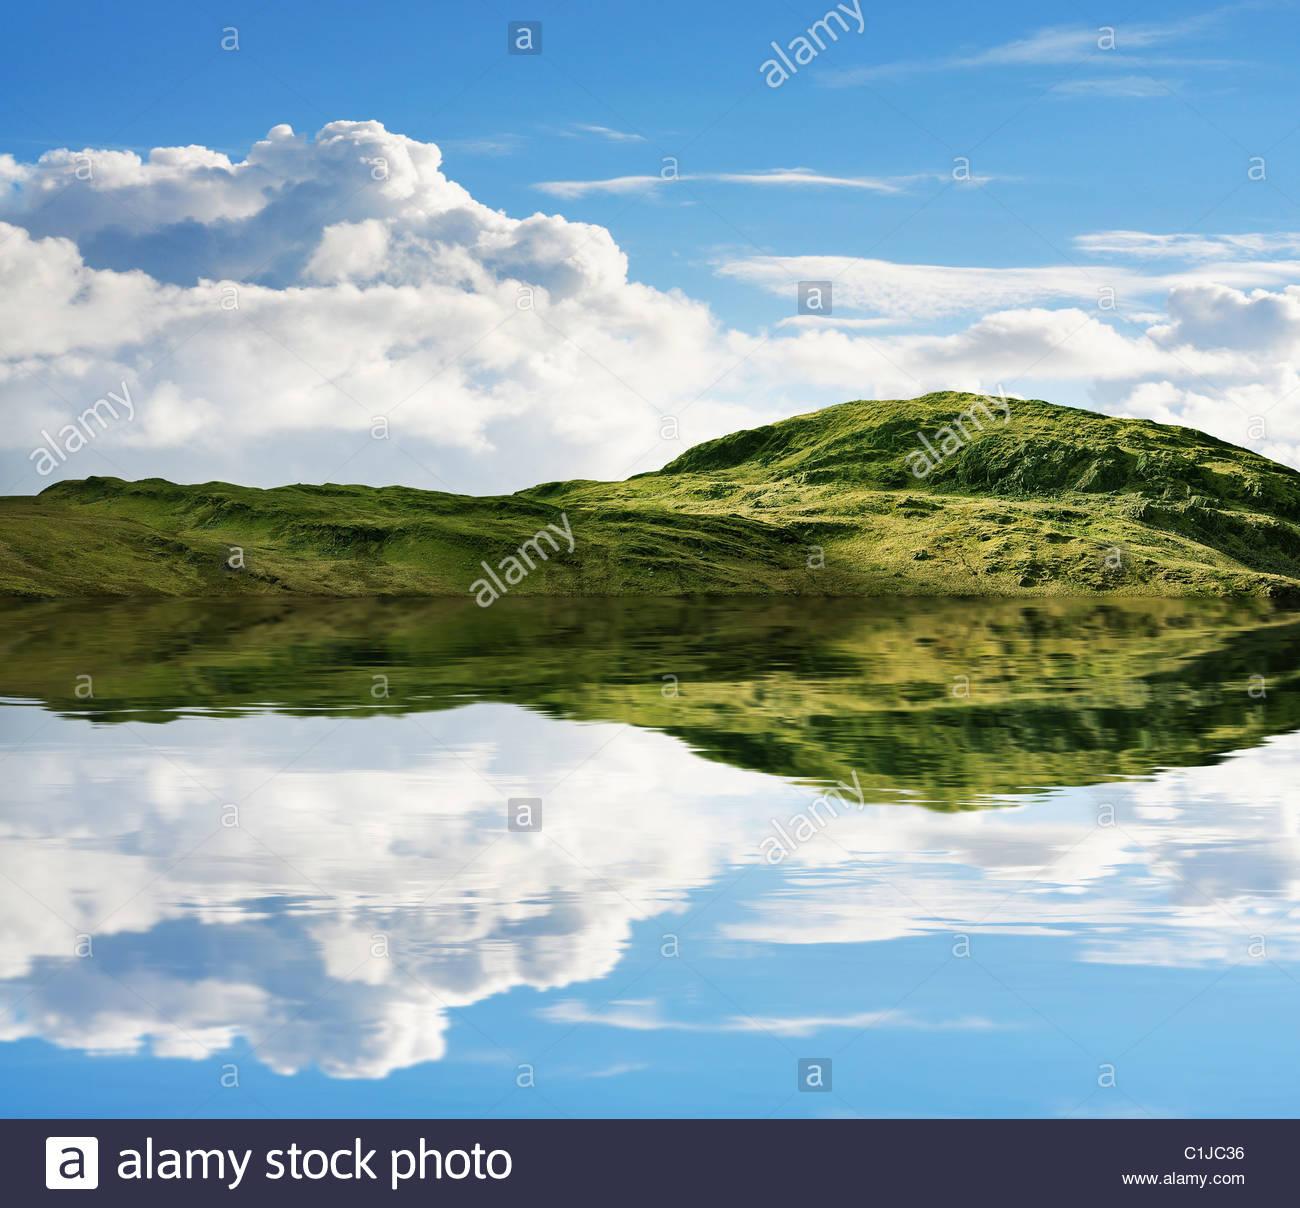 Rugged hill lake - Stock Image